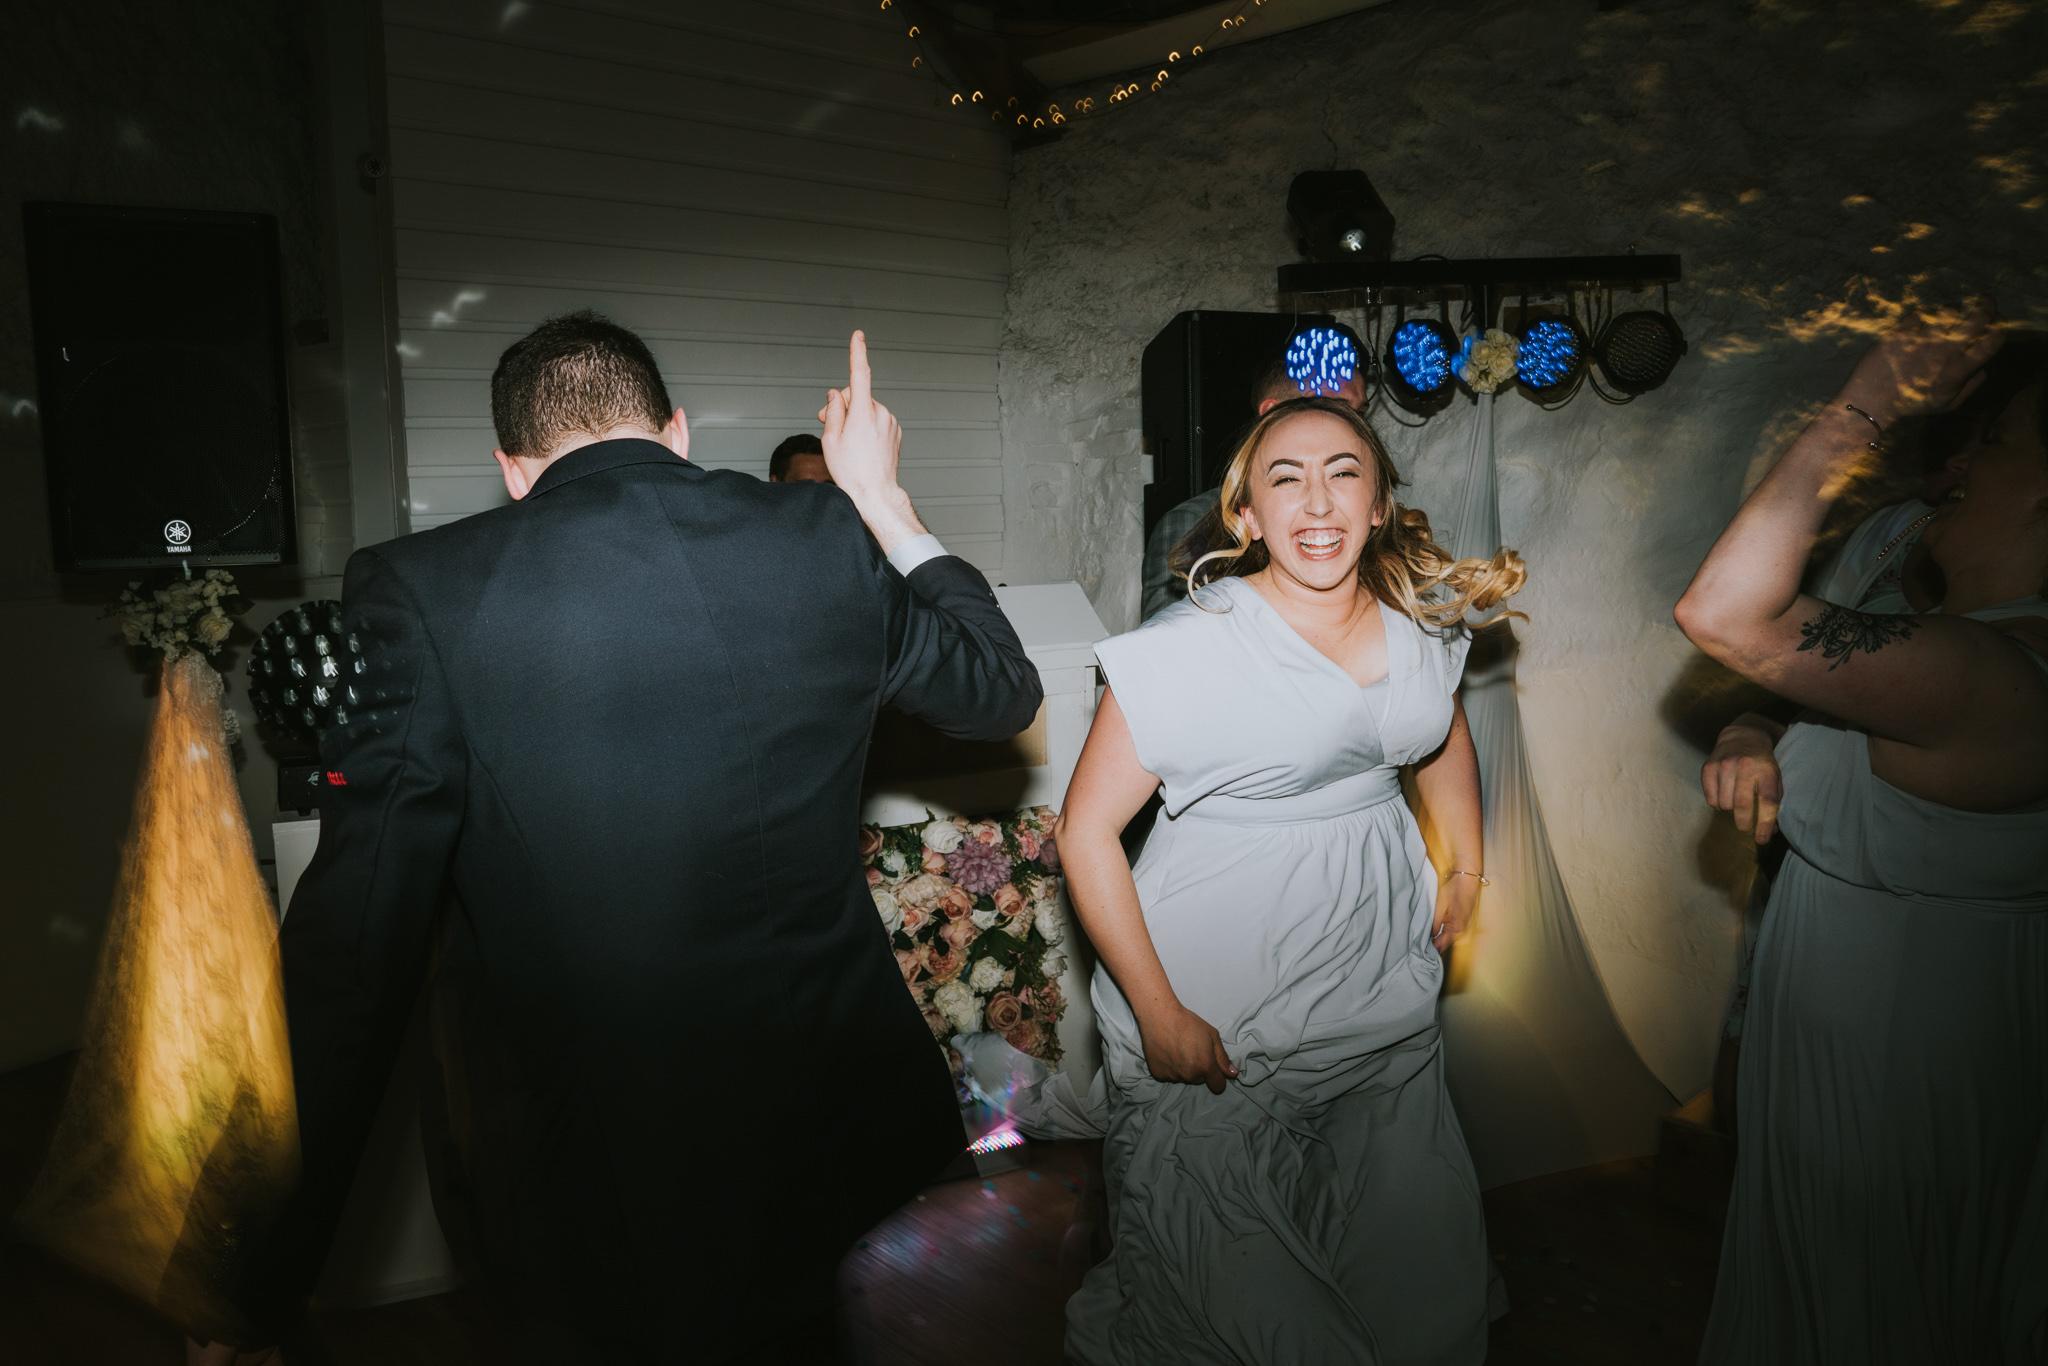 grace-sam-old-barn-clovelly-devon-wedding-photographer-grace-elizabeth-essex-suffolk-norfolk-wedding-photographer (127 of 132).jpg